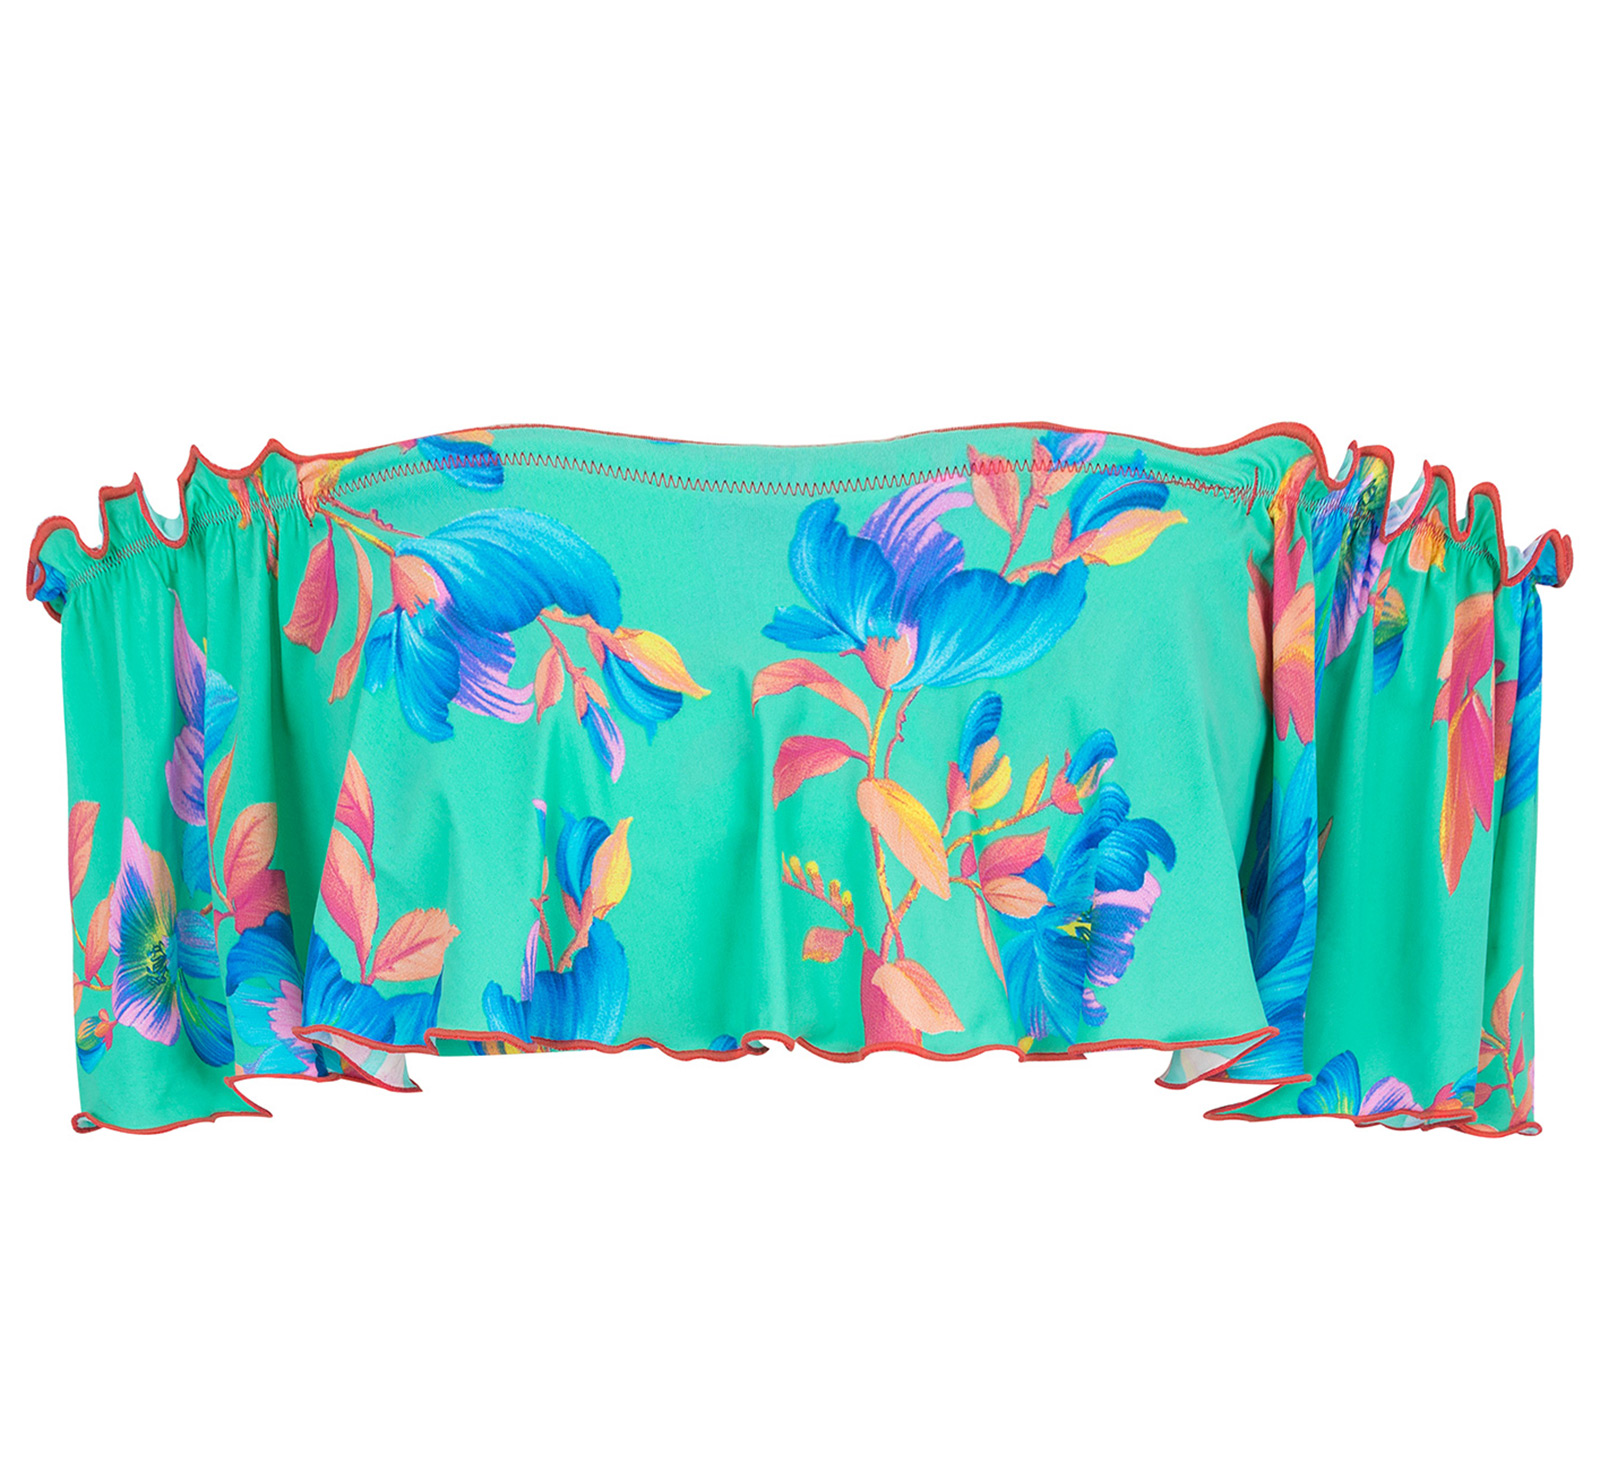 Turquoise WaterSpider Crop Top